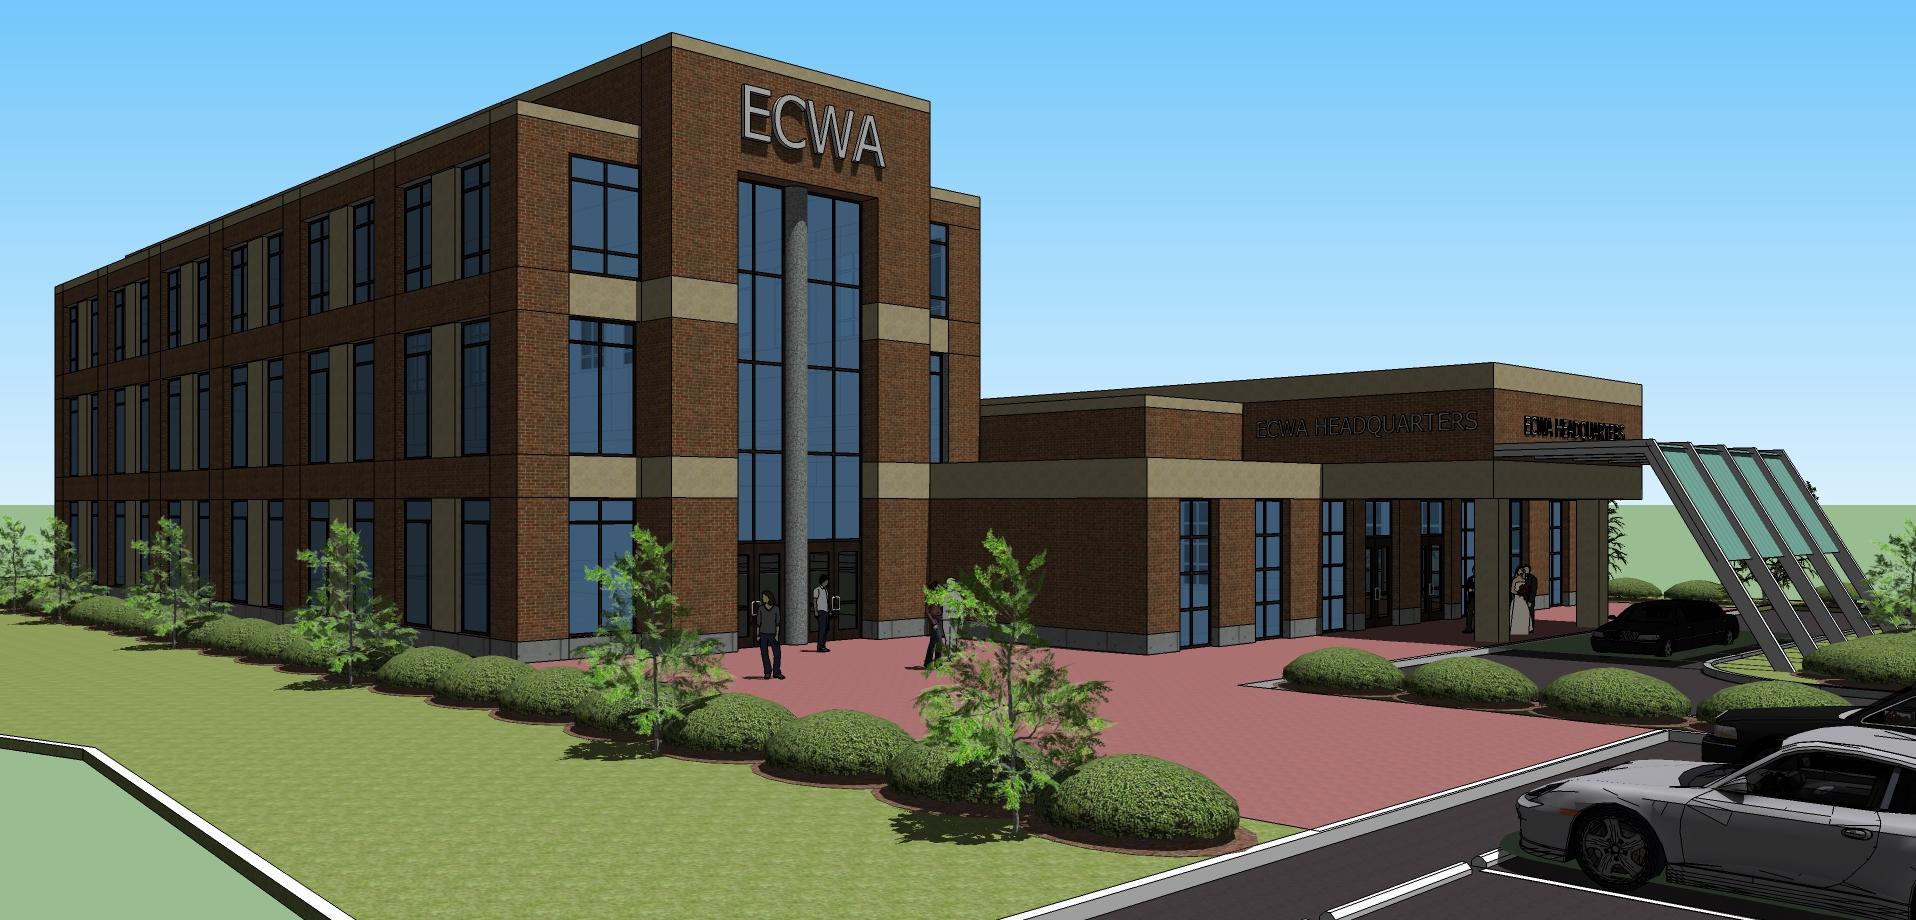 ECWA Church